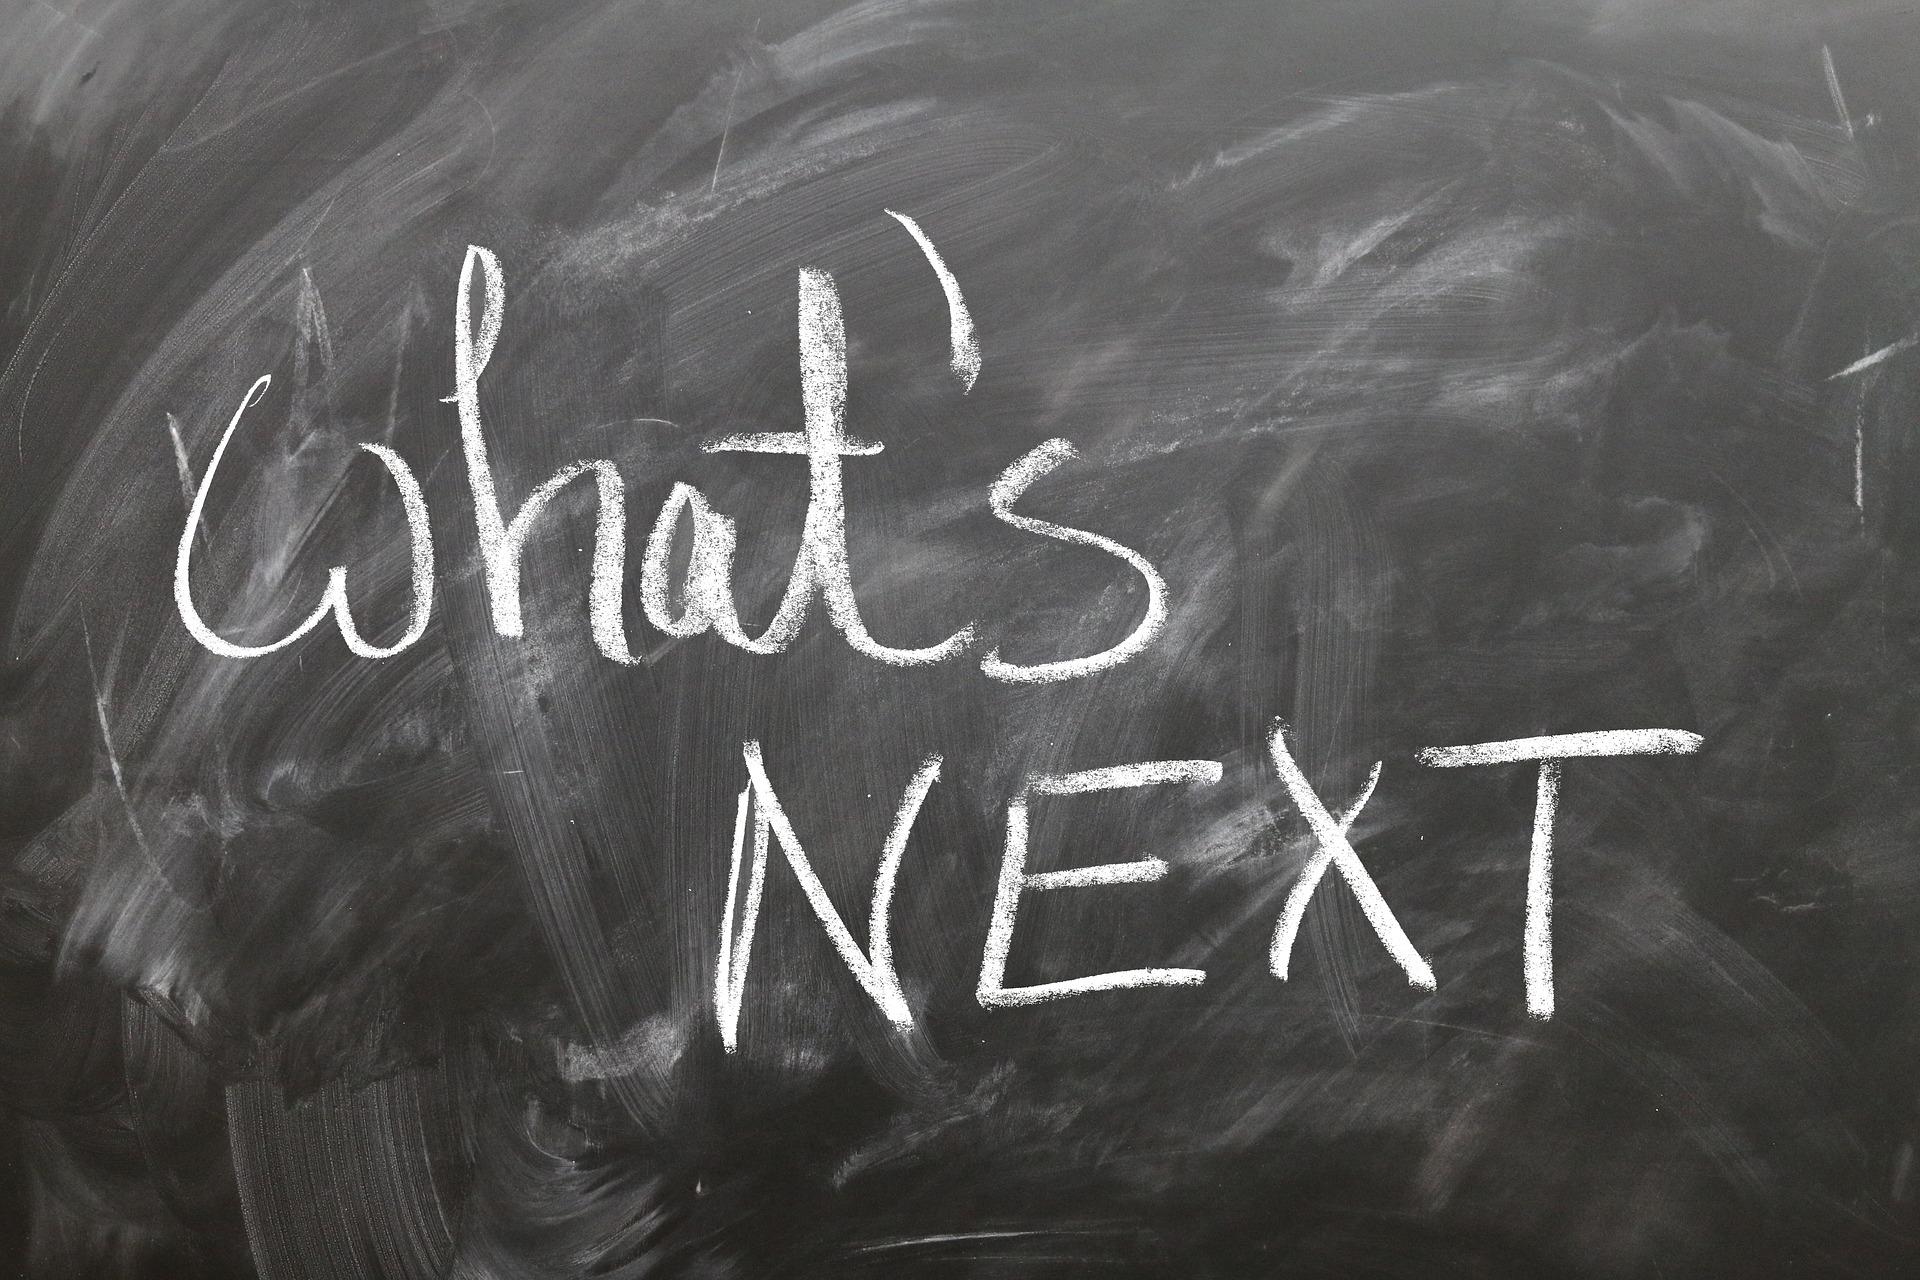 What's Next On Written On Black Board